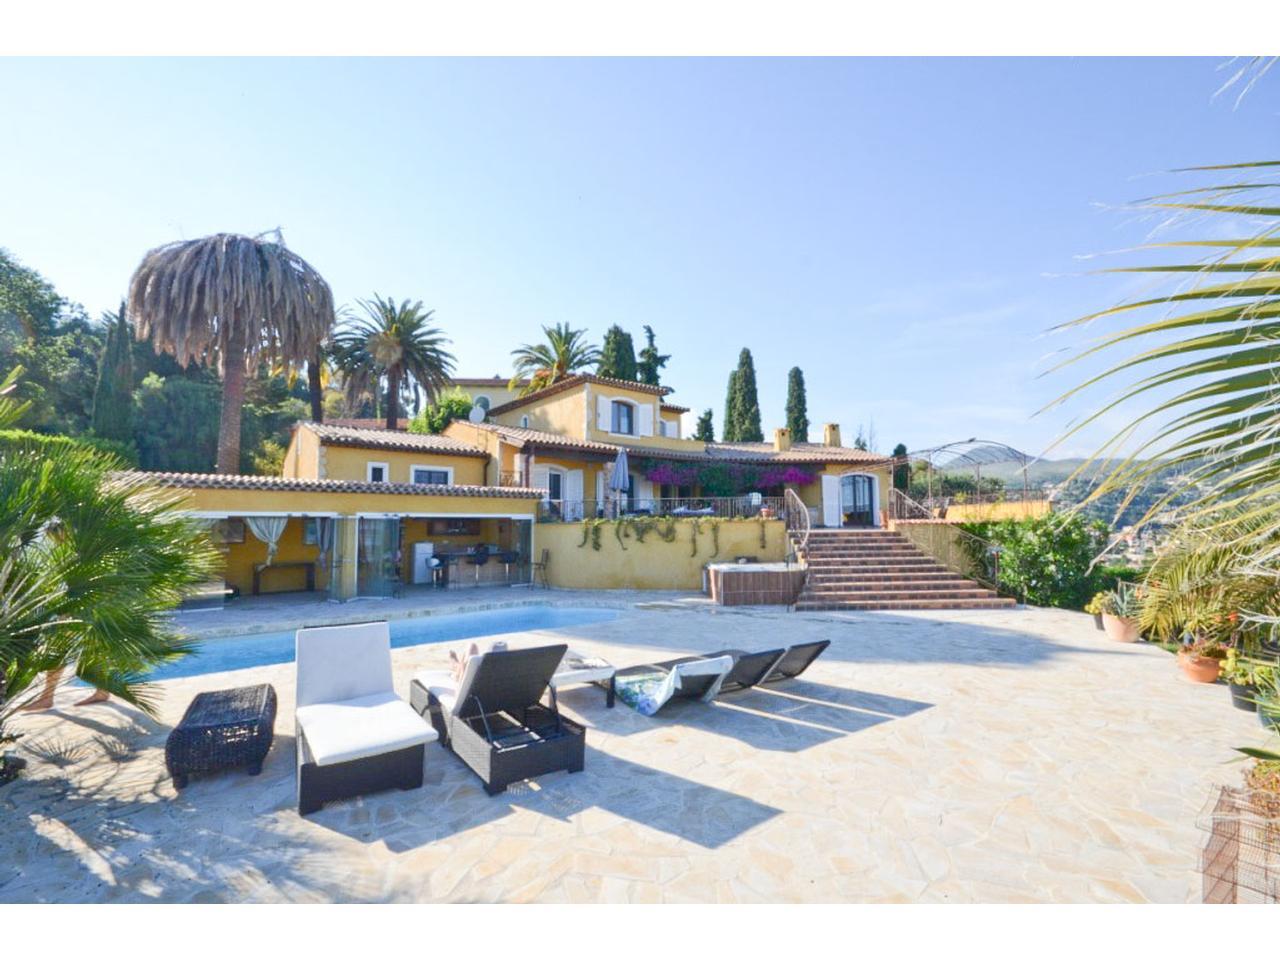 immobilier nice vue mer maison nice villa neo provencale a vendre vue mer nice. Black Bedroom Furniture Sets. Home Design Ideas